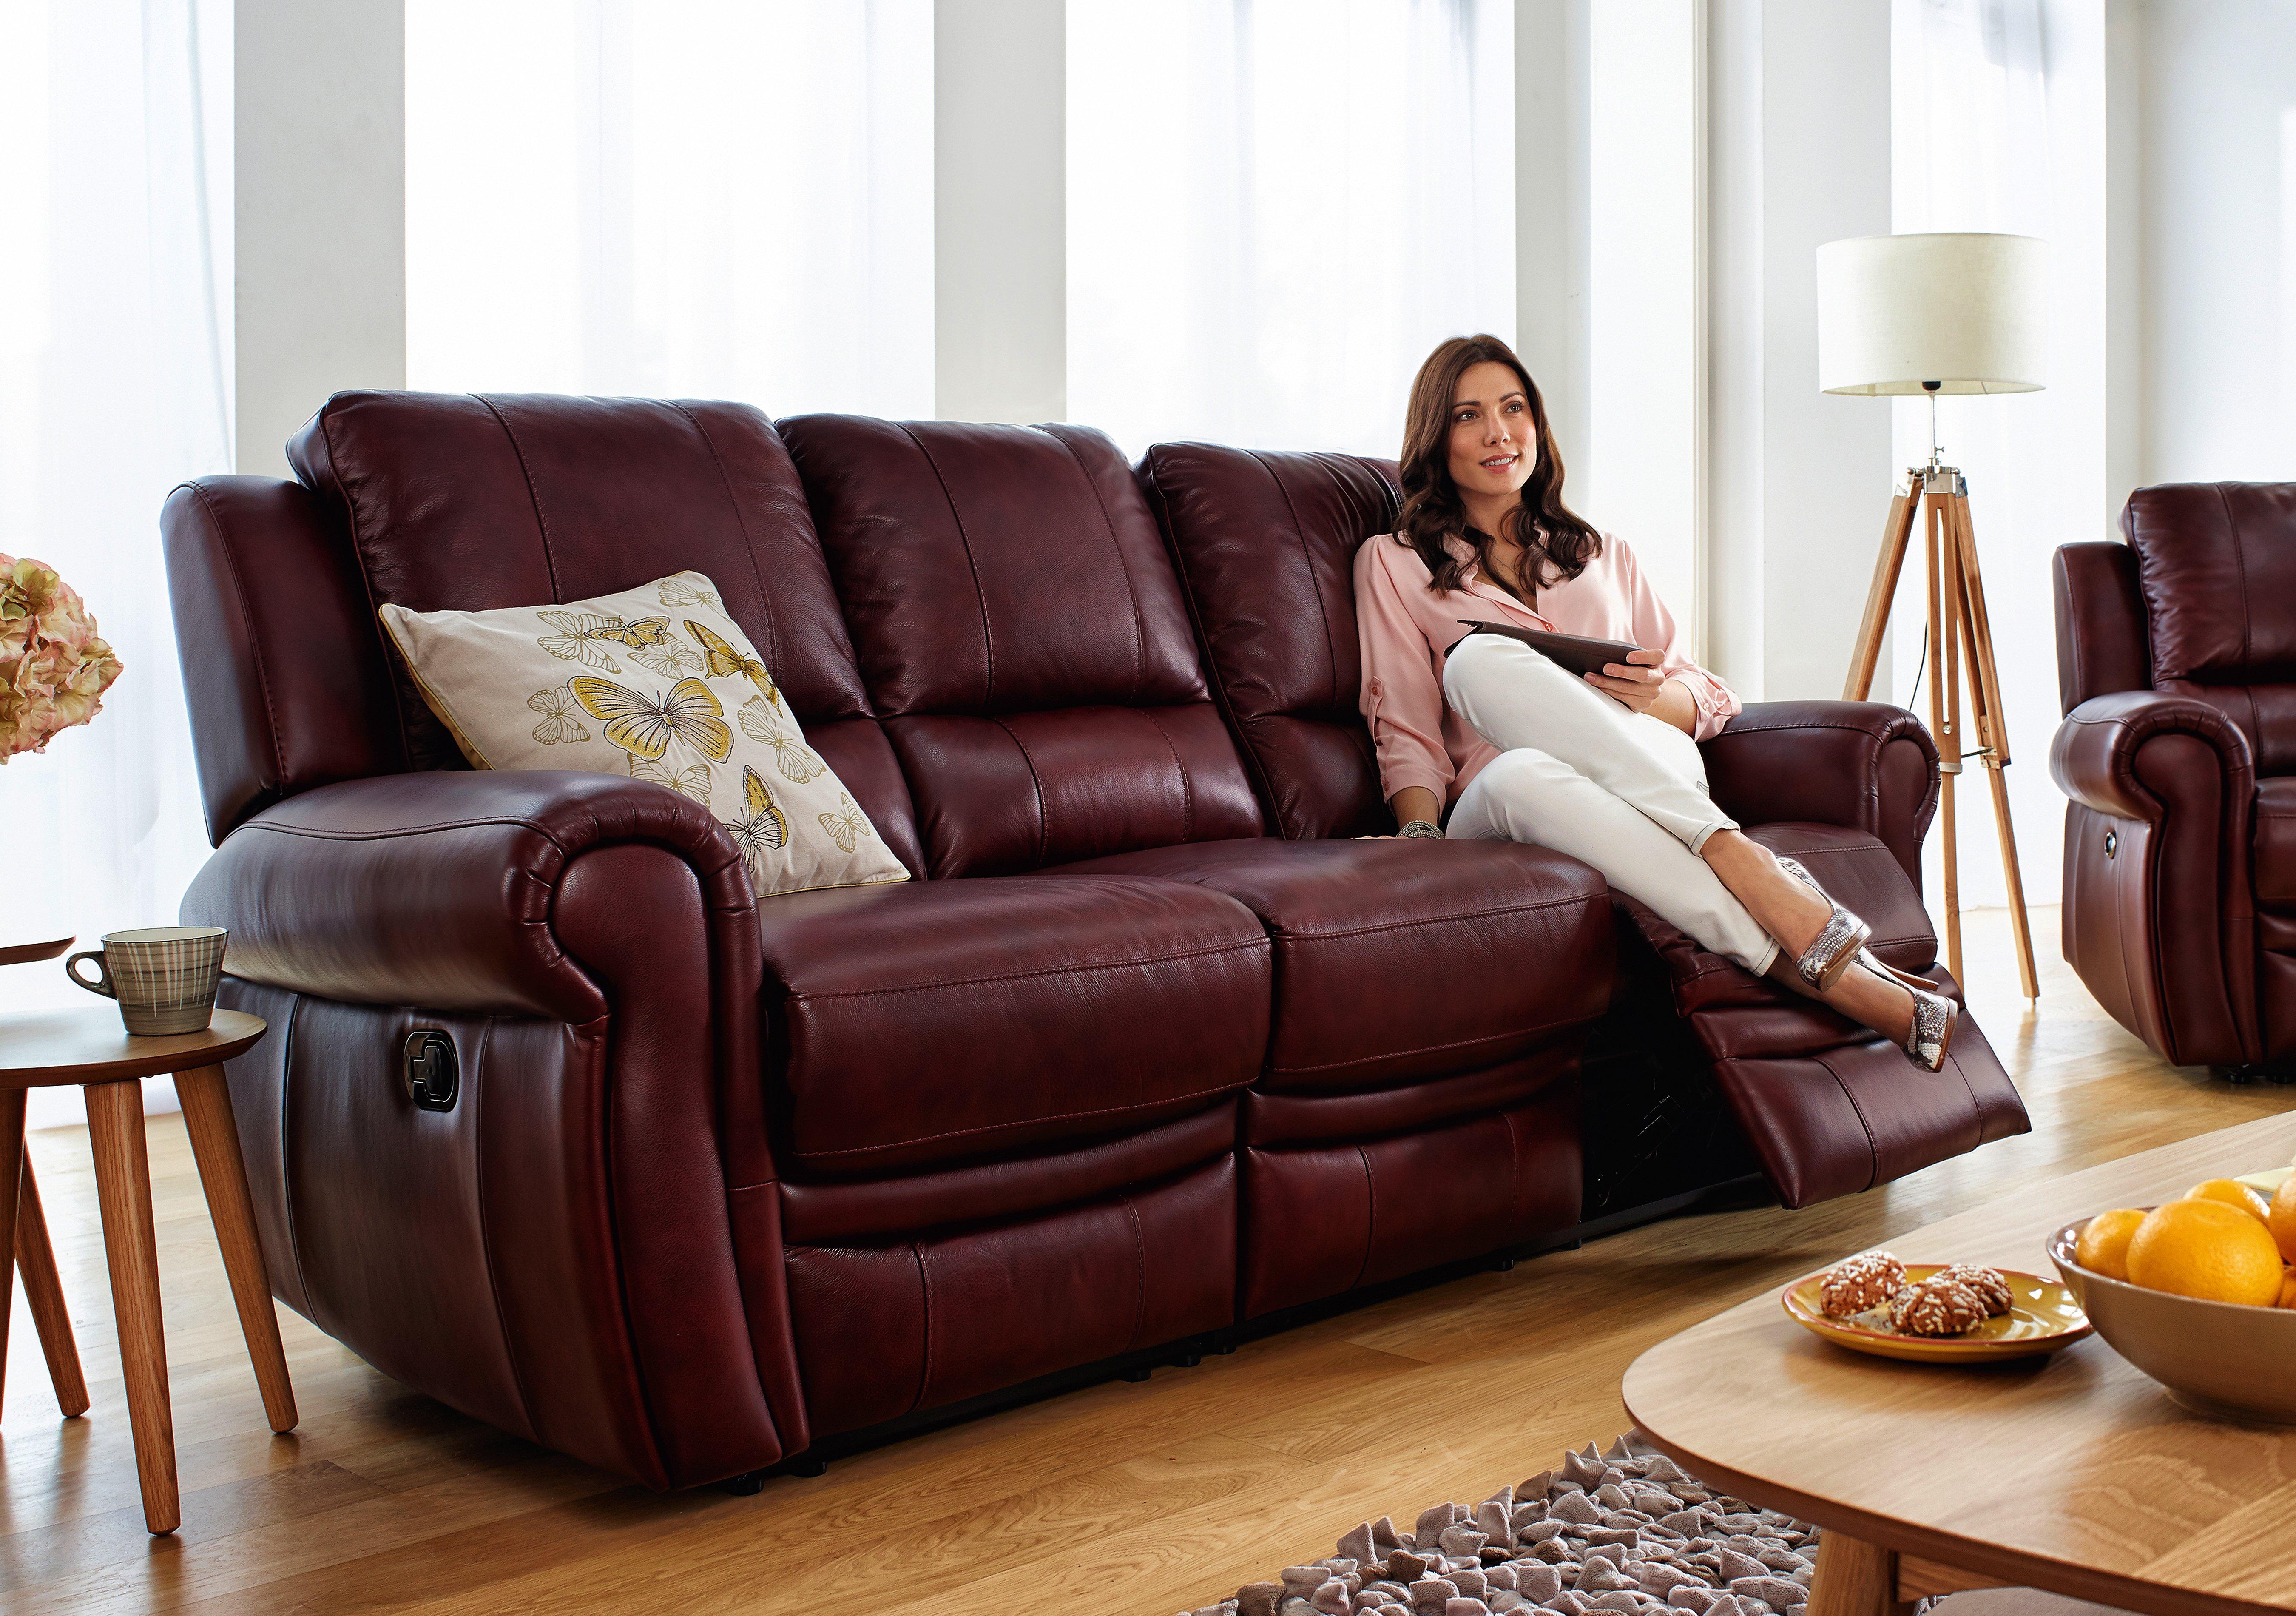 Arizona 3 Seater Leather Recliner Sofa Furniture Village